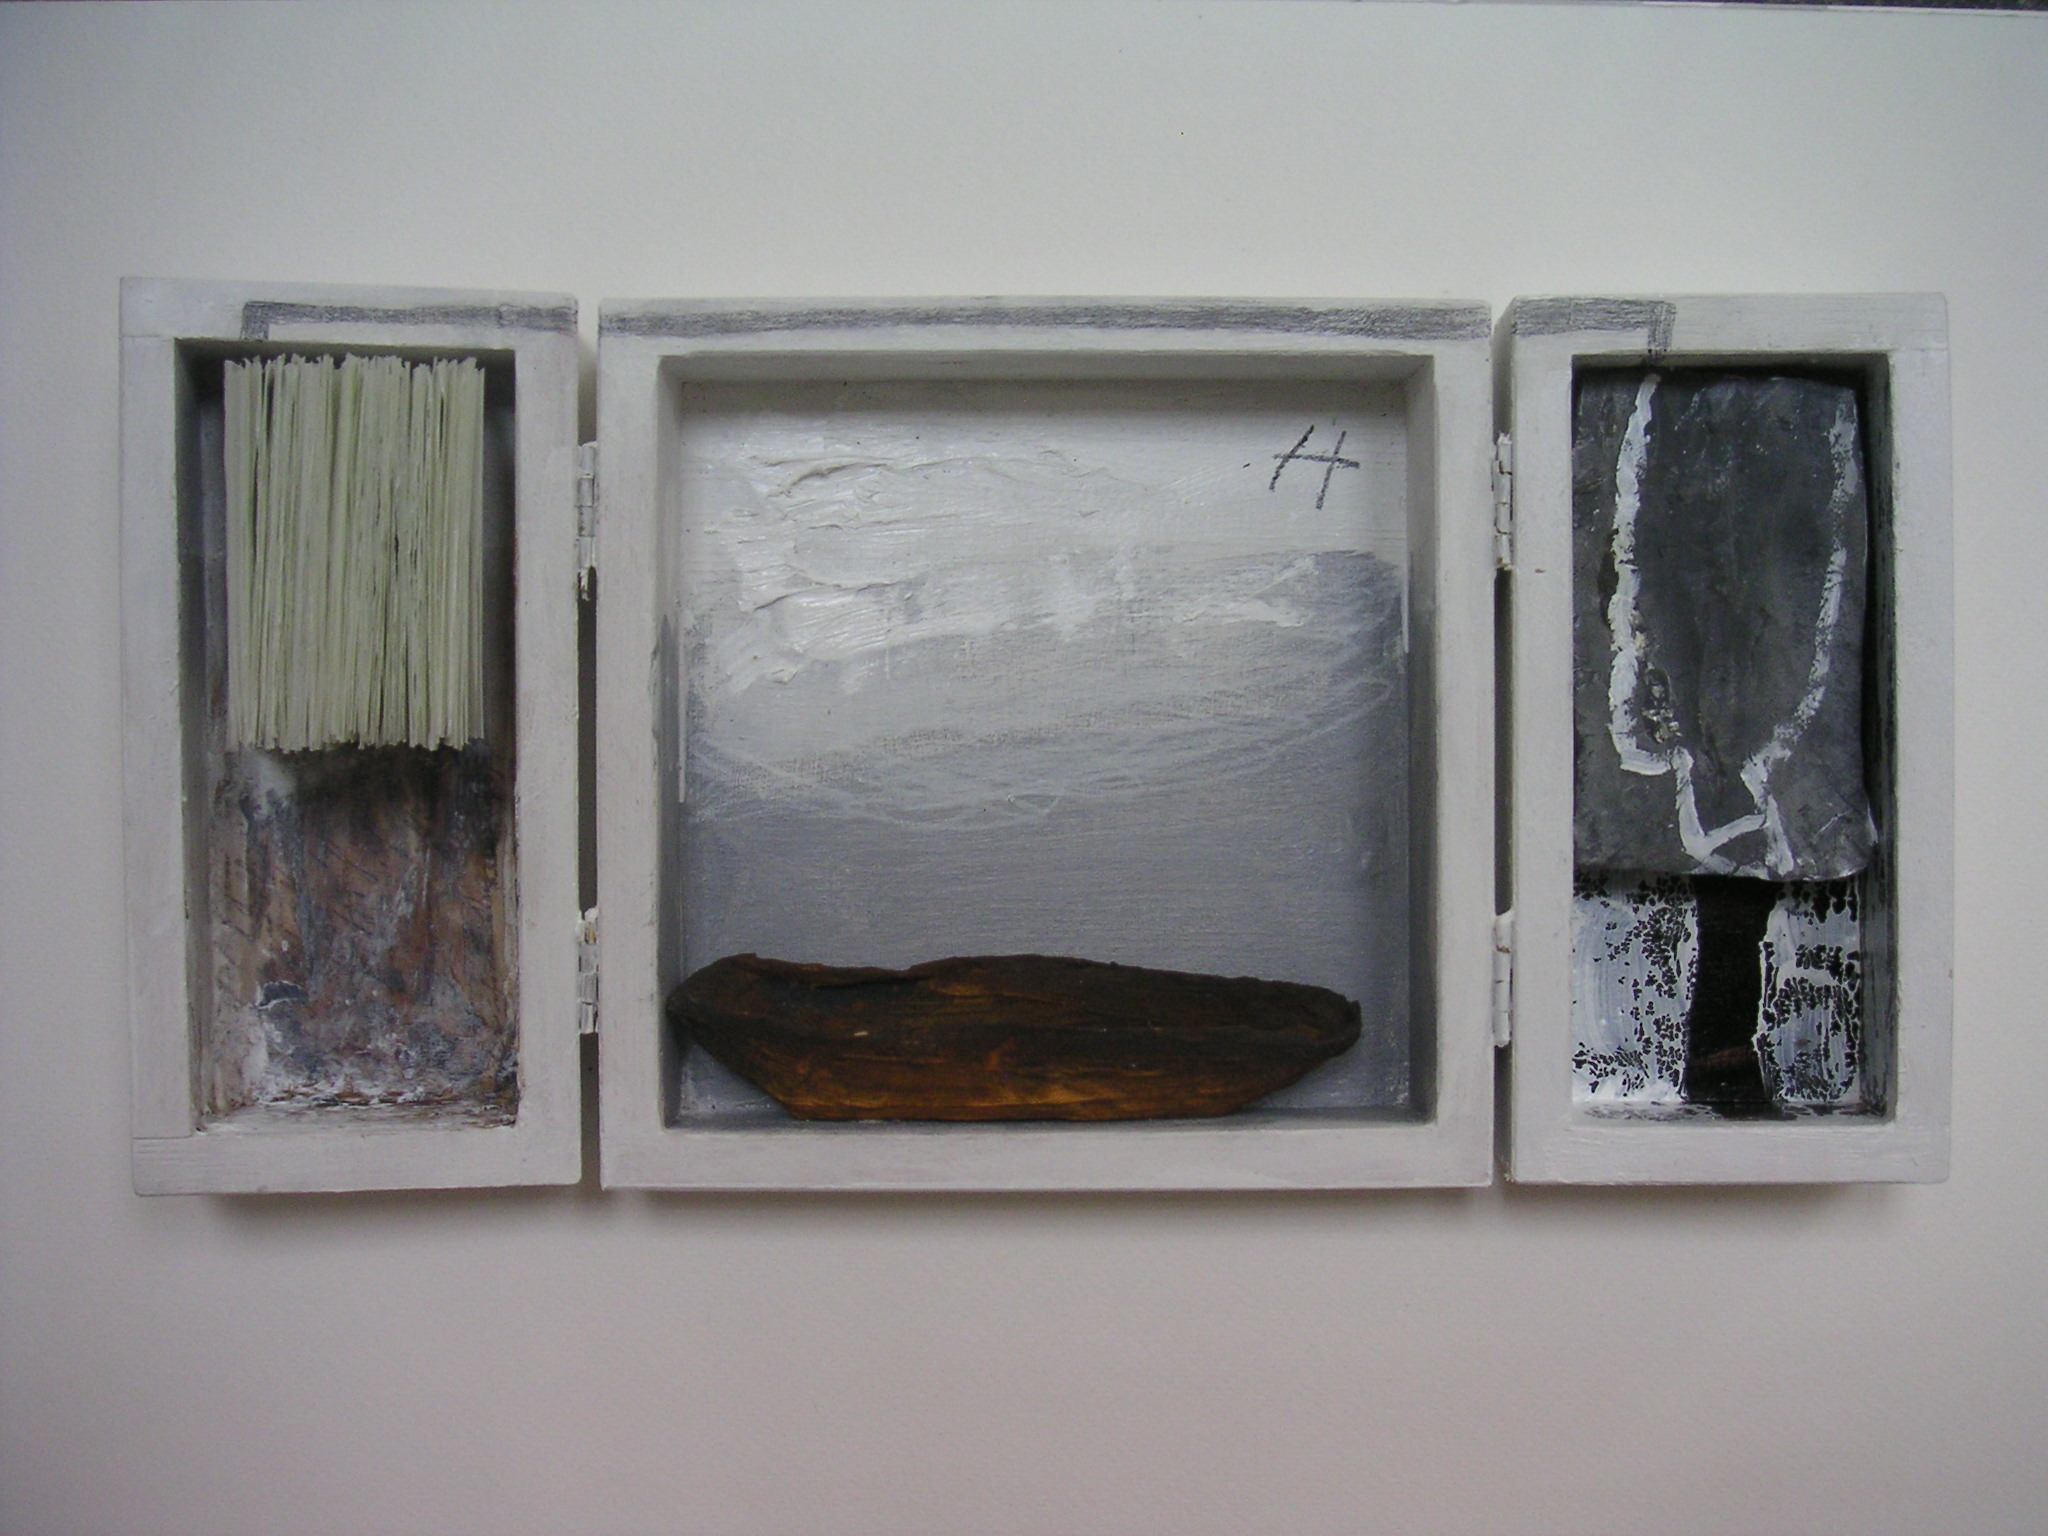 o.T., 2009, Objekt-Klappkasten, 30 x 15 x 2,5 cm